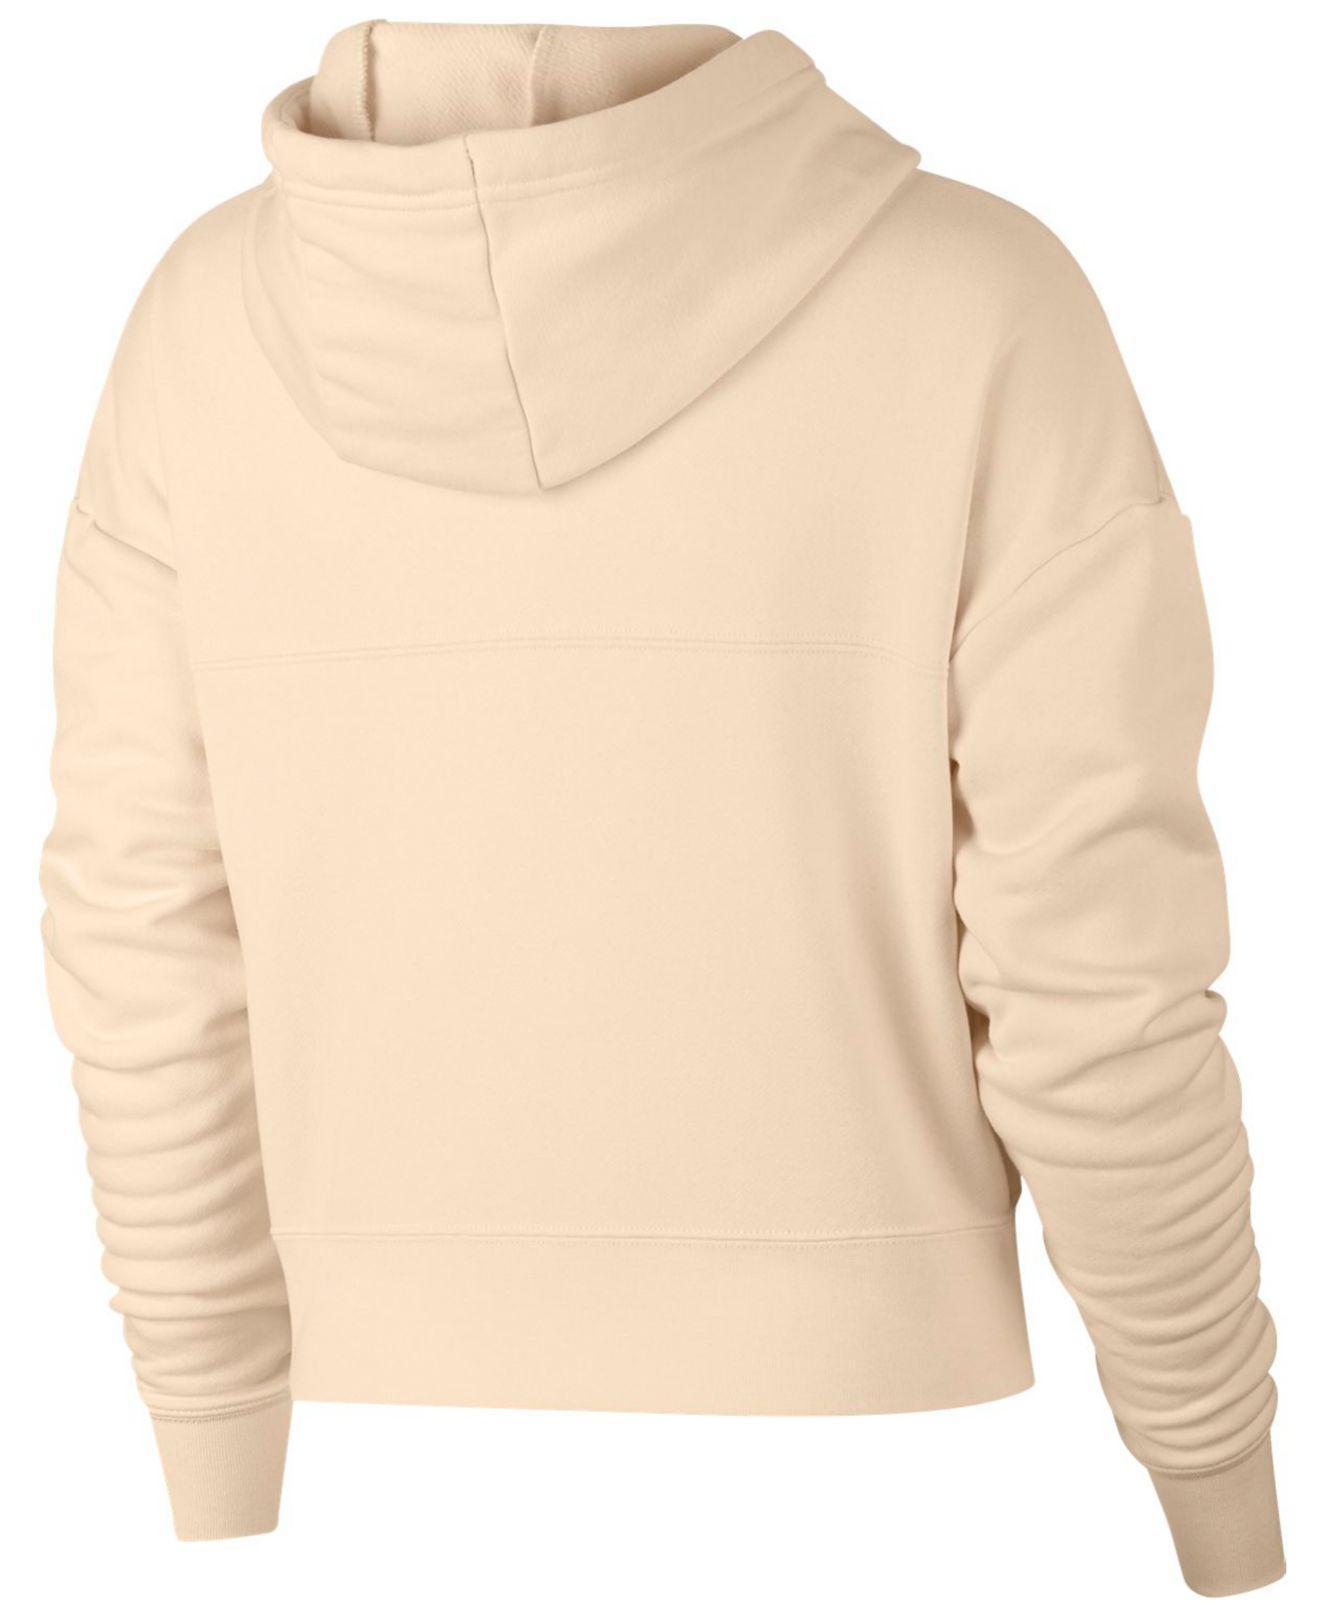 b24e46a71bd7d Lyst - Nike Sportswear Rally Metallic-logo Fleece Cropped Hoodie in Natural  - Save 25%